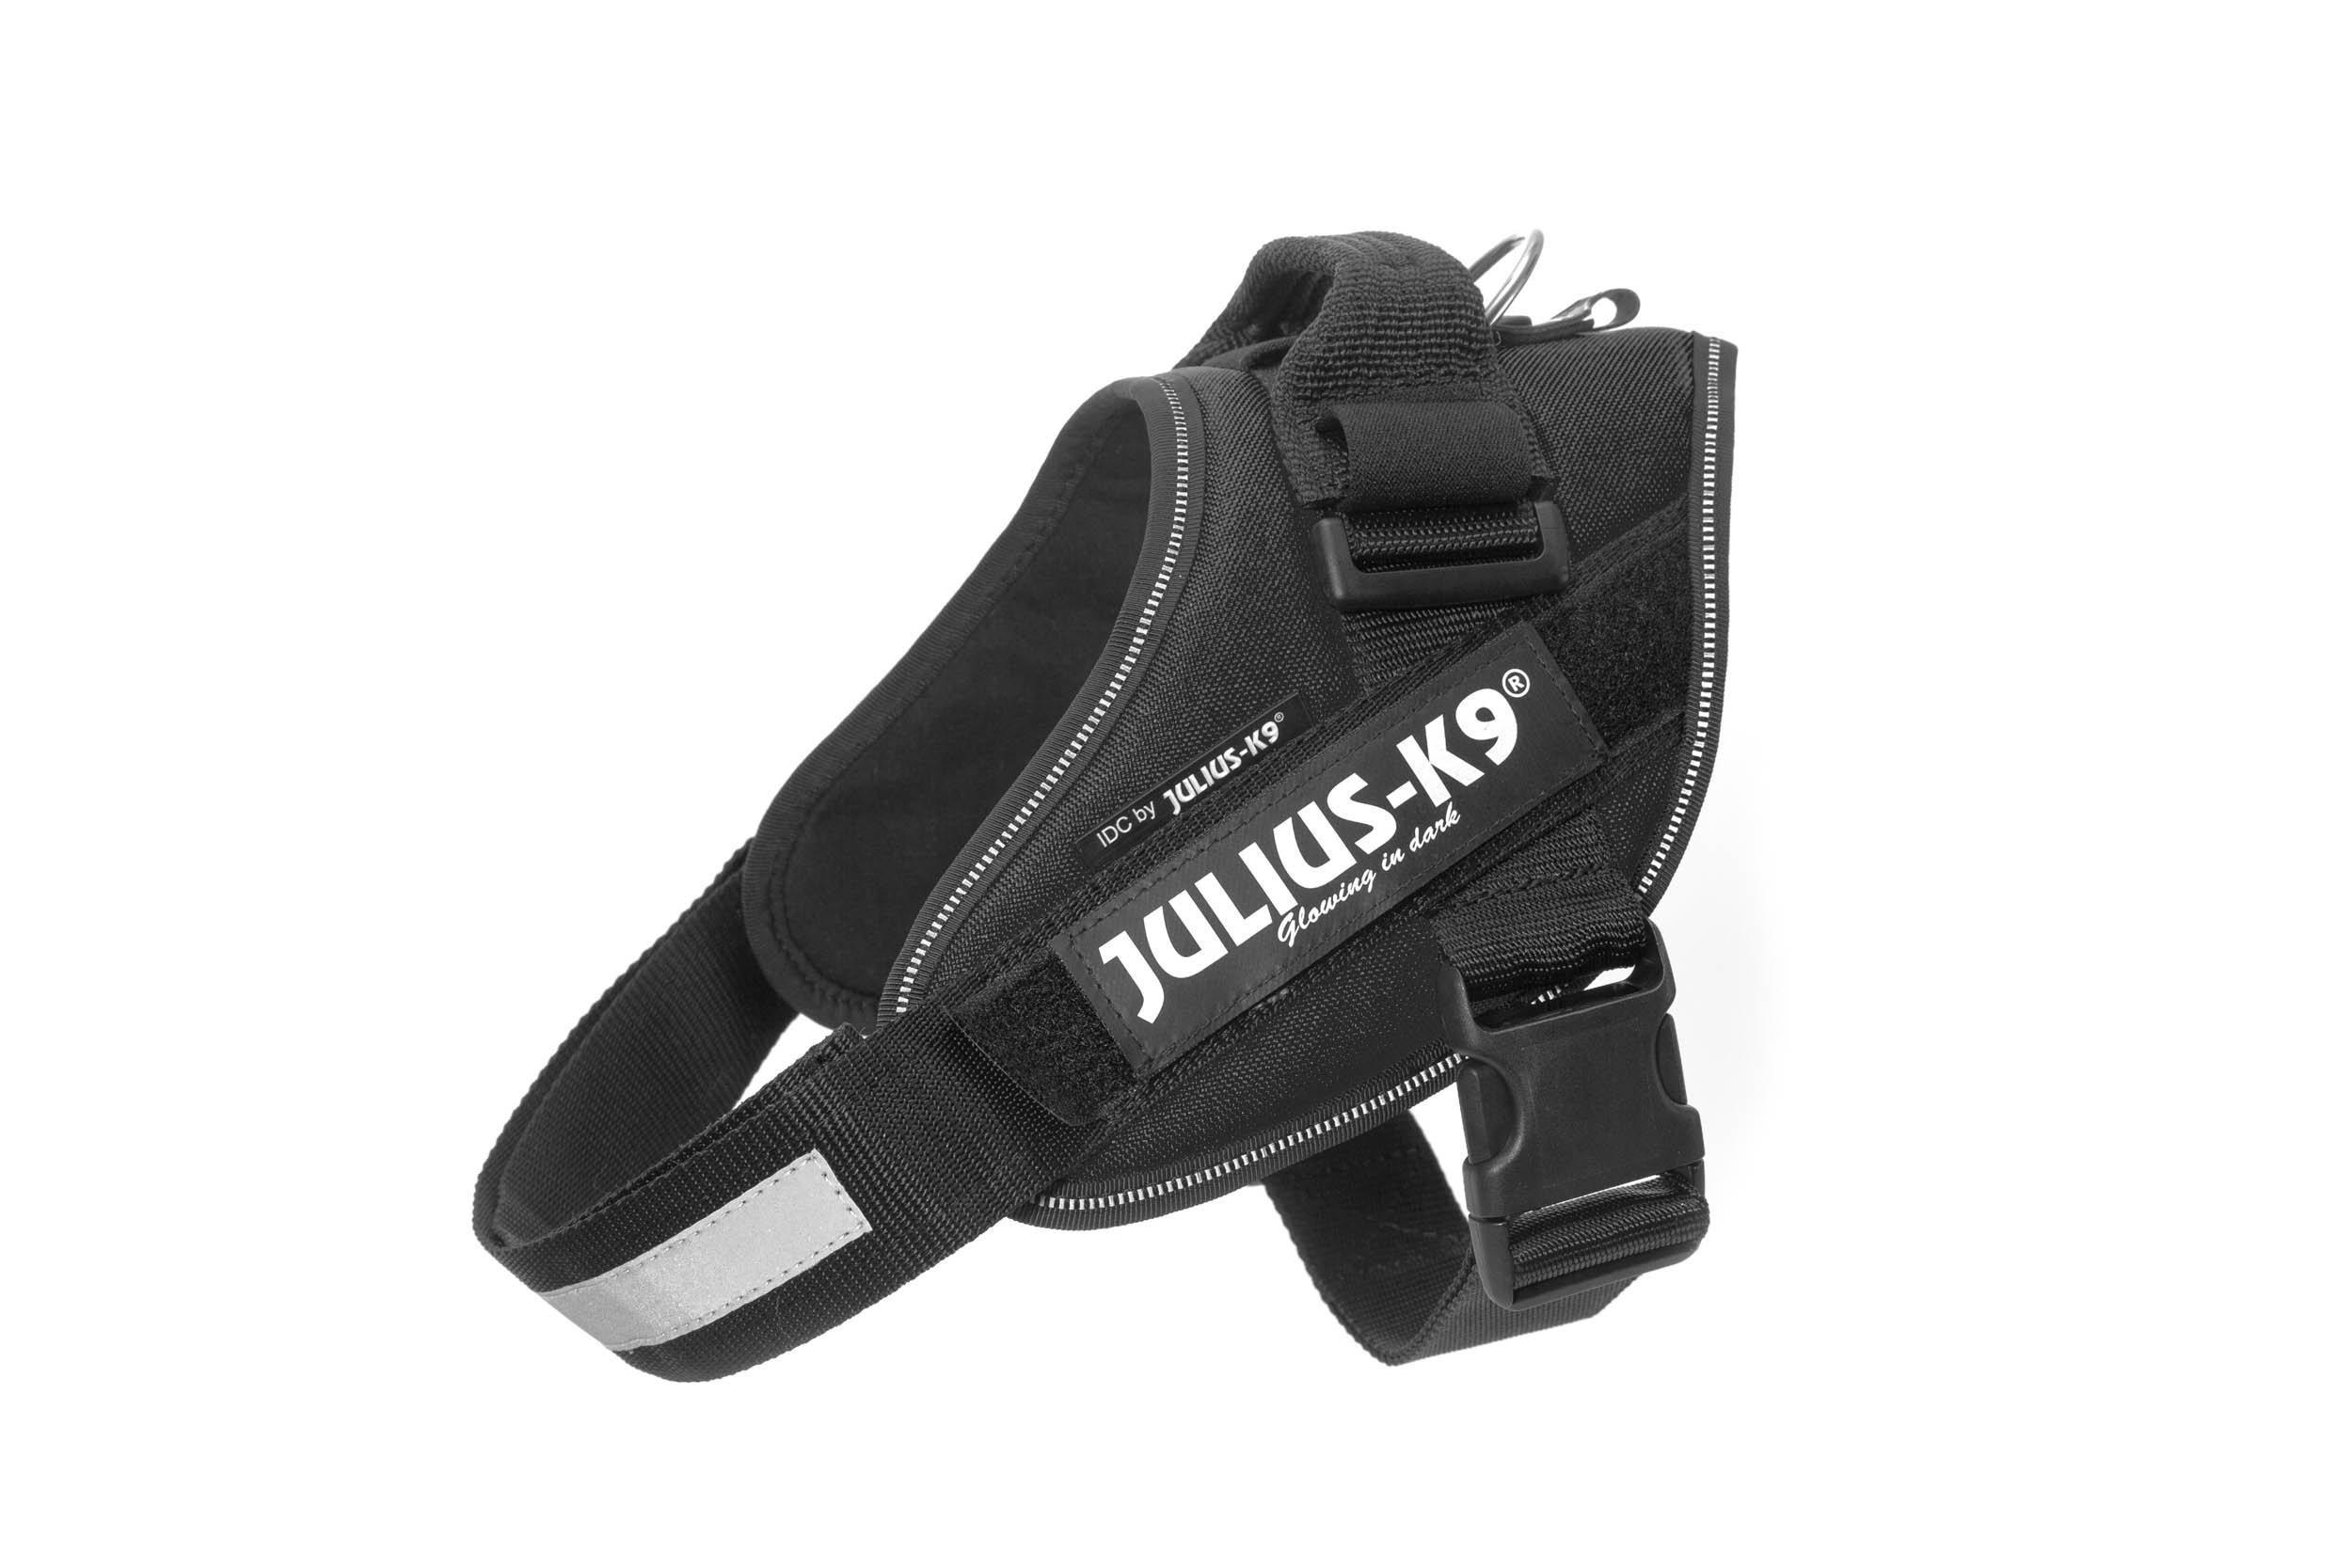 Julius-K9, 16IDC-P-0, IDC Powerharness, dog harness, Size: 0, Black